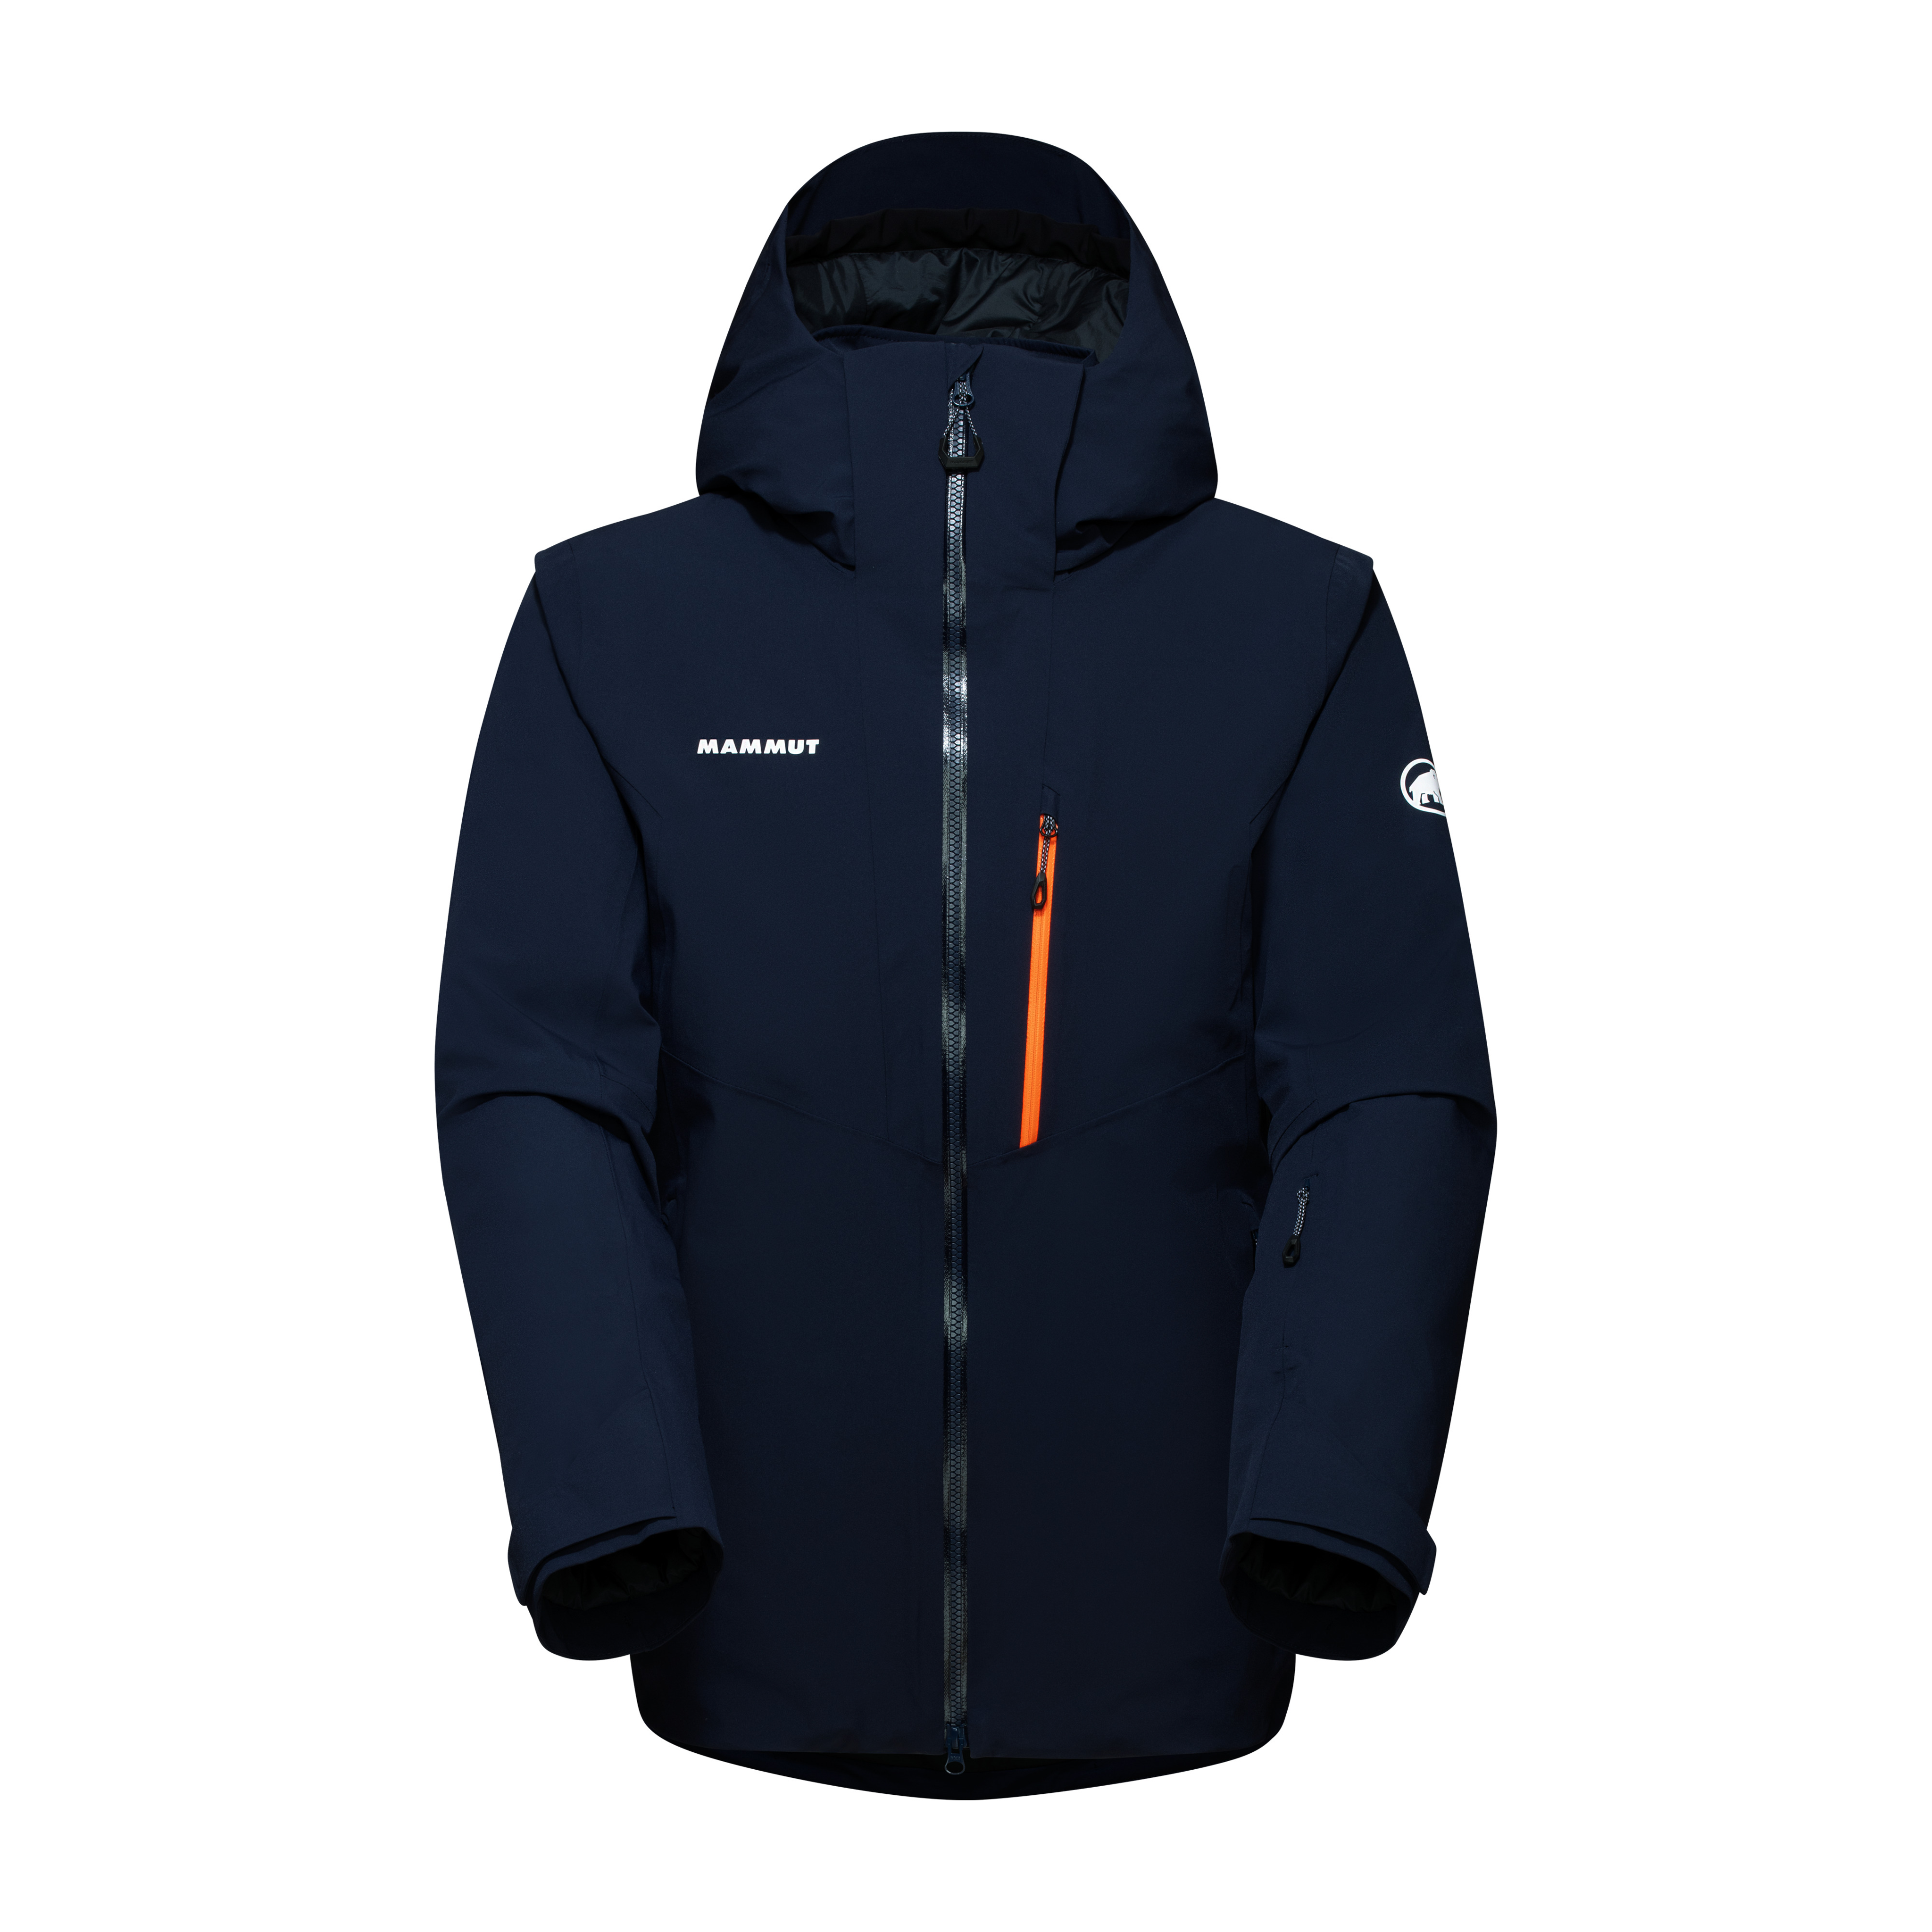 Stoney HS Thermo Jacket Men - marine-vibrant orange, S thumbnail